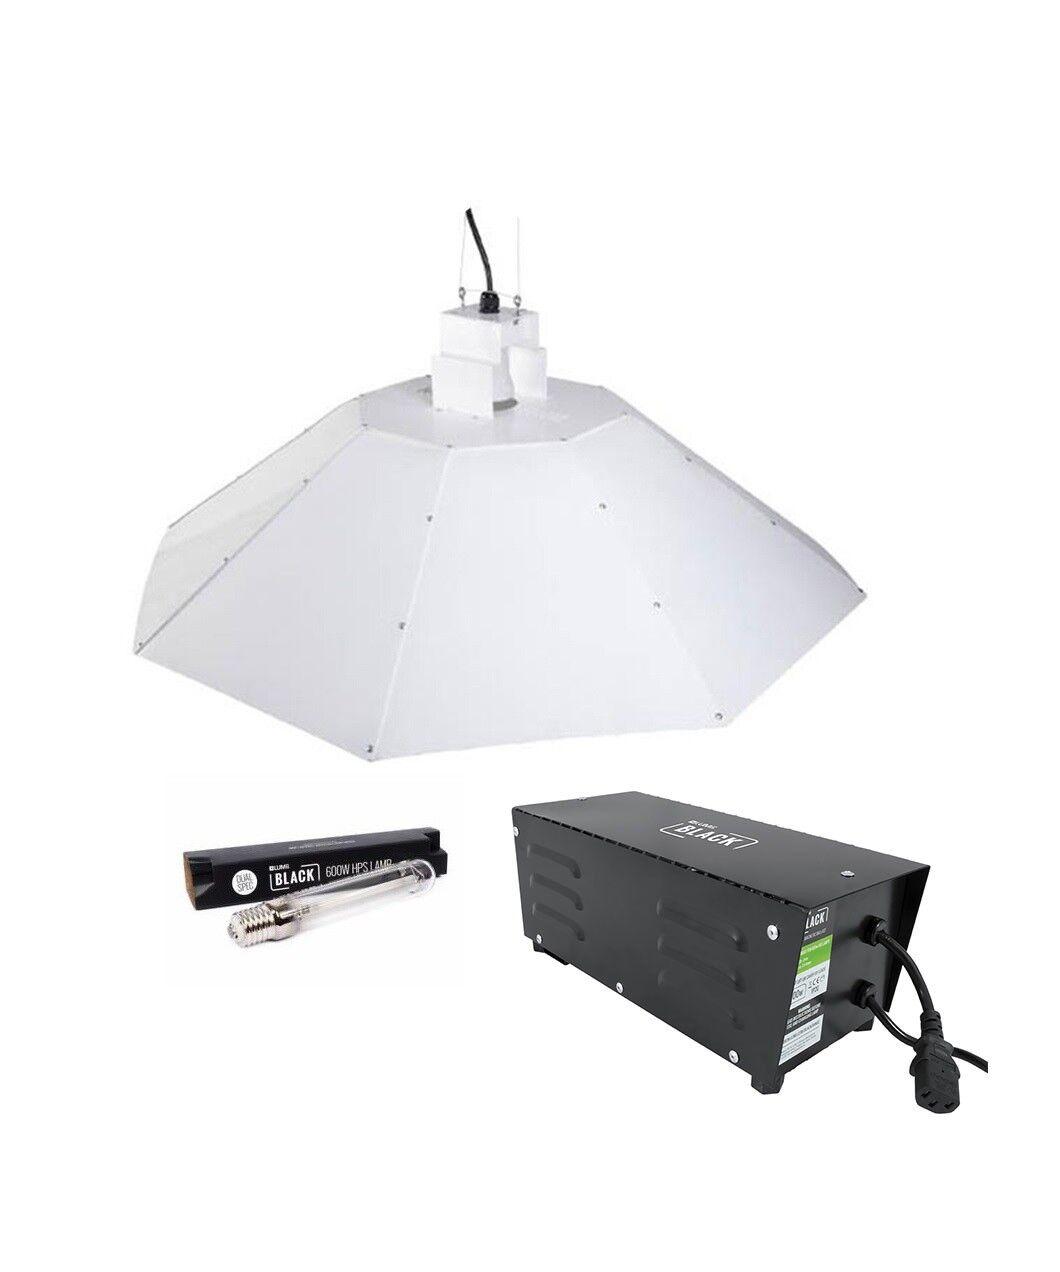 PARABOLICA Ombra Grow Light Kit Zavorra LAMPADINA Shade 1mtr coltura idroponica 600 W kit luce